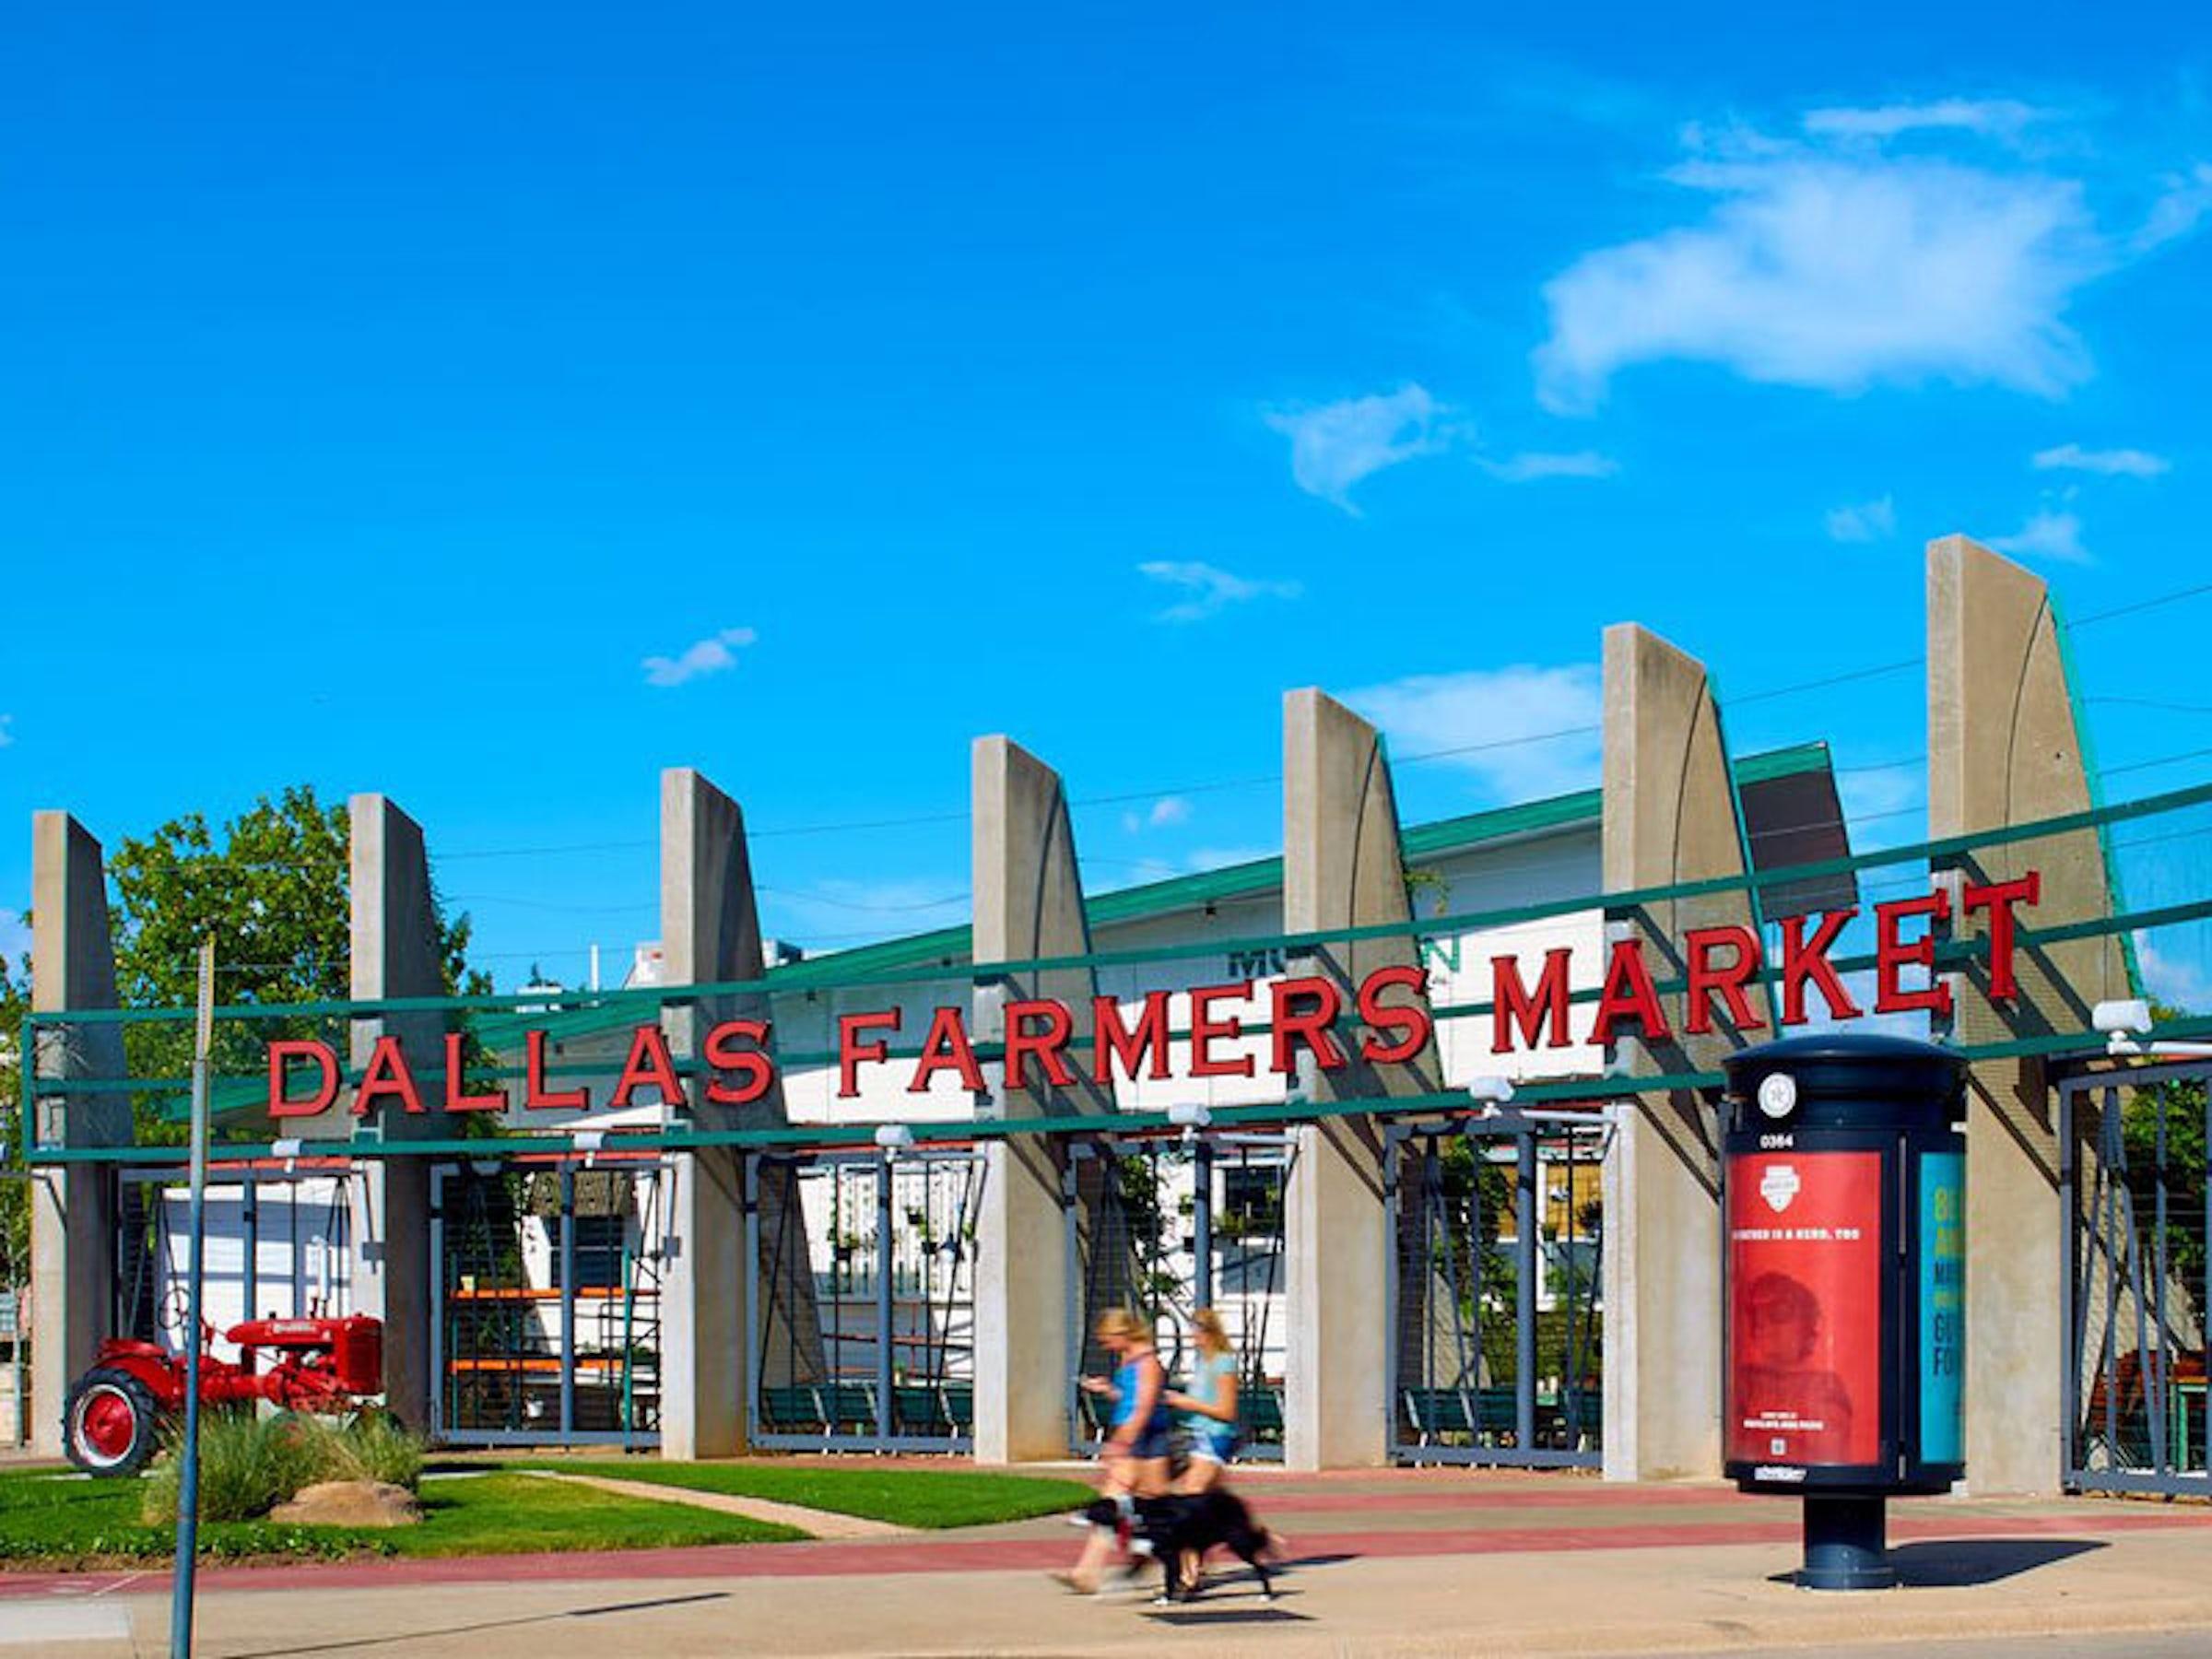 Dallas Farmers Market in Beyond Dallas